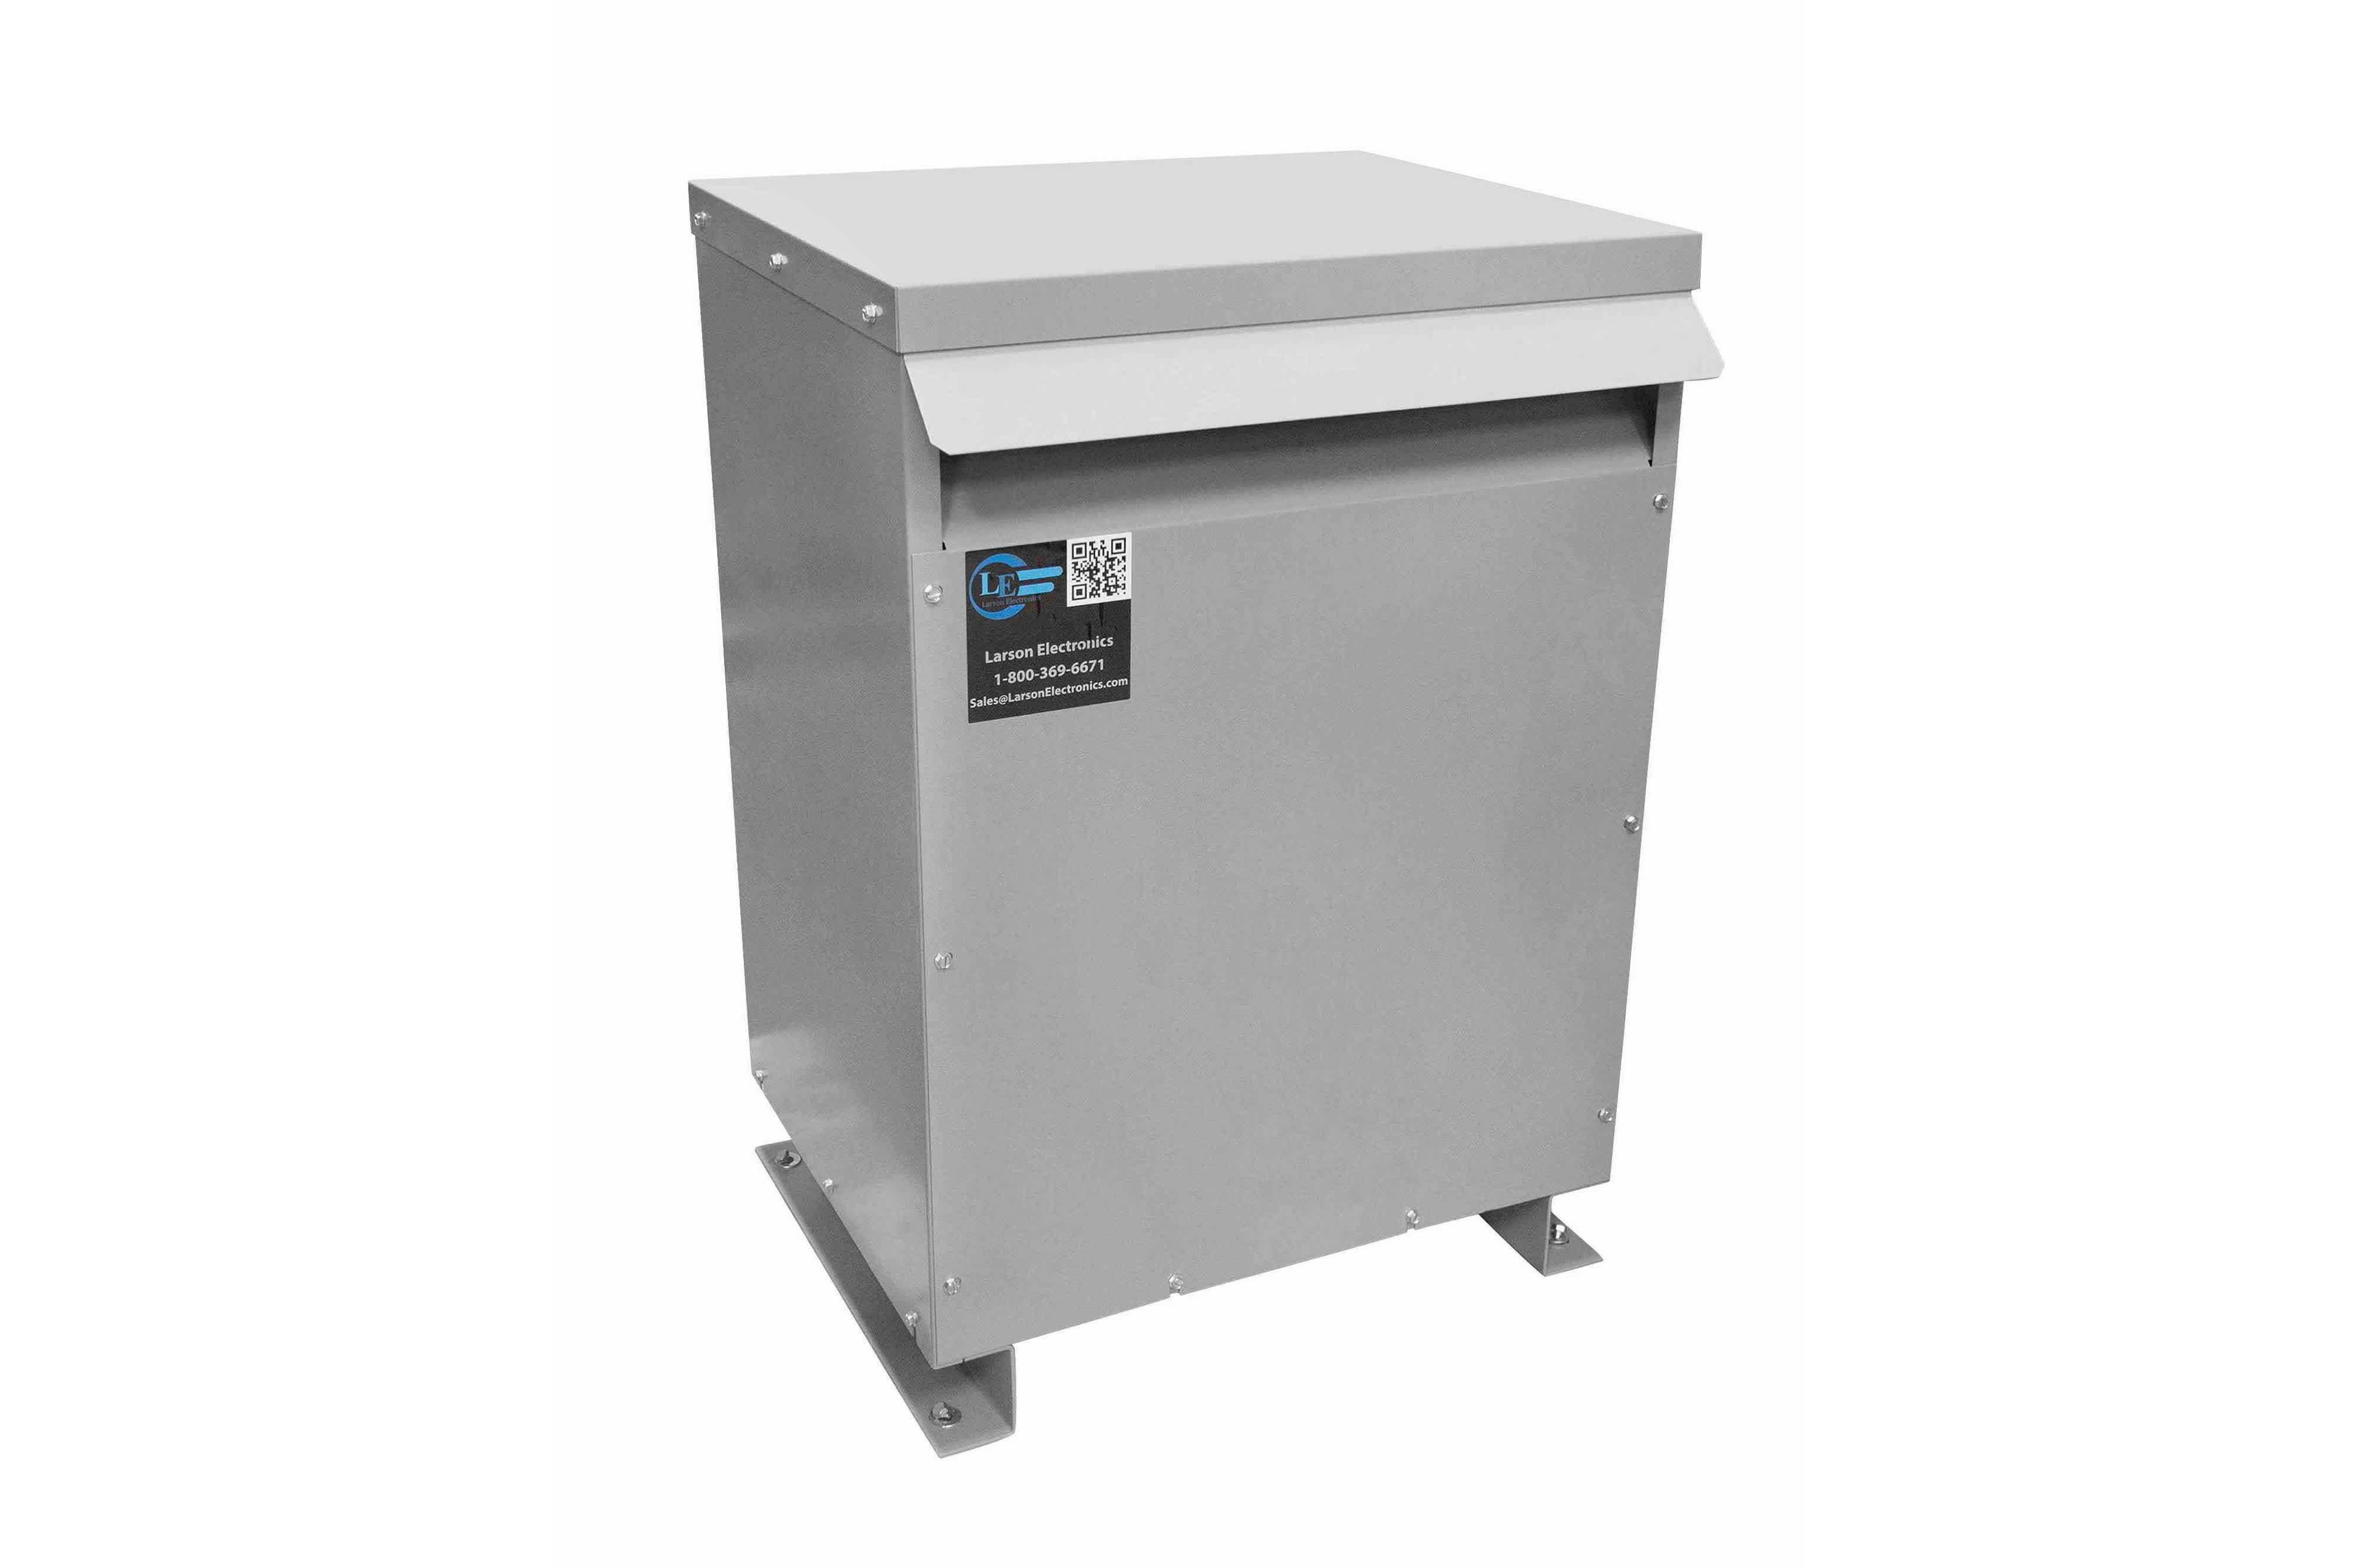 9 kVA 3PH Isolation Transformer, 575V Wye Primary, 240V Delta Secondary, N3R, Ventilated, 60 Hz